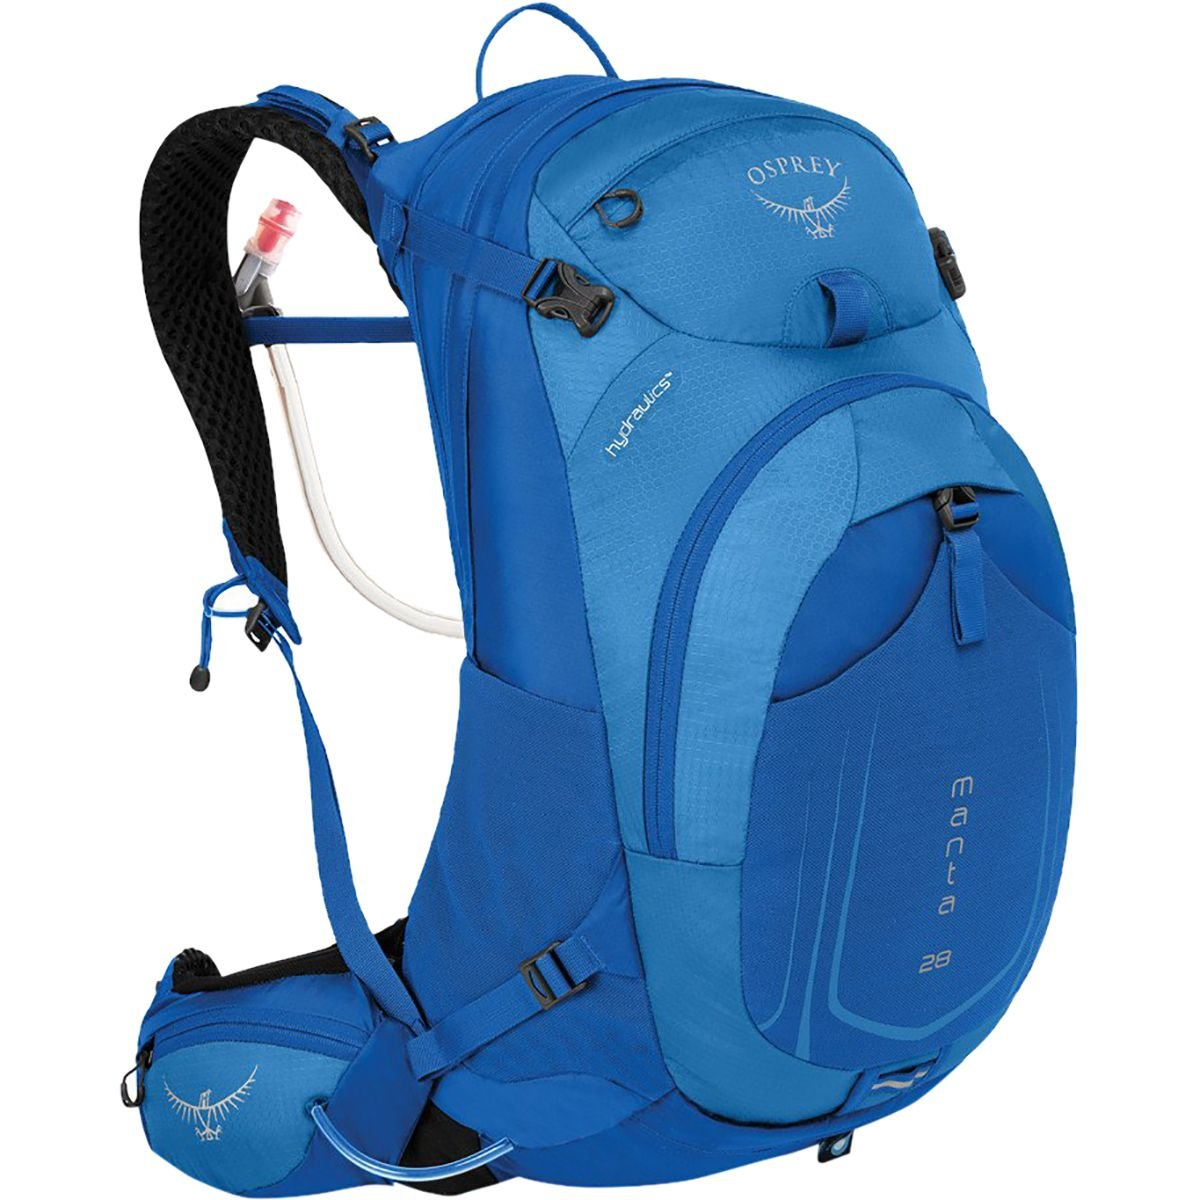 Osprey Packs Manta AG 28 Hydration Pack, Sonic Blue, Small/Medium